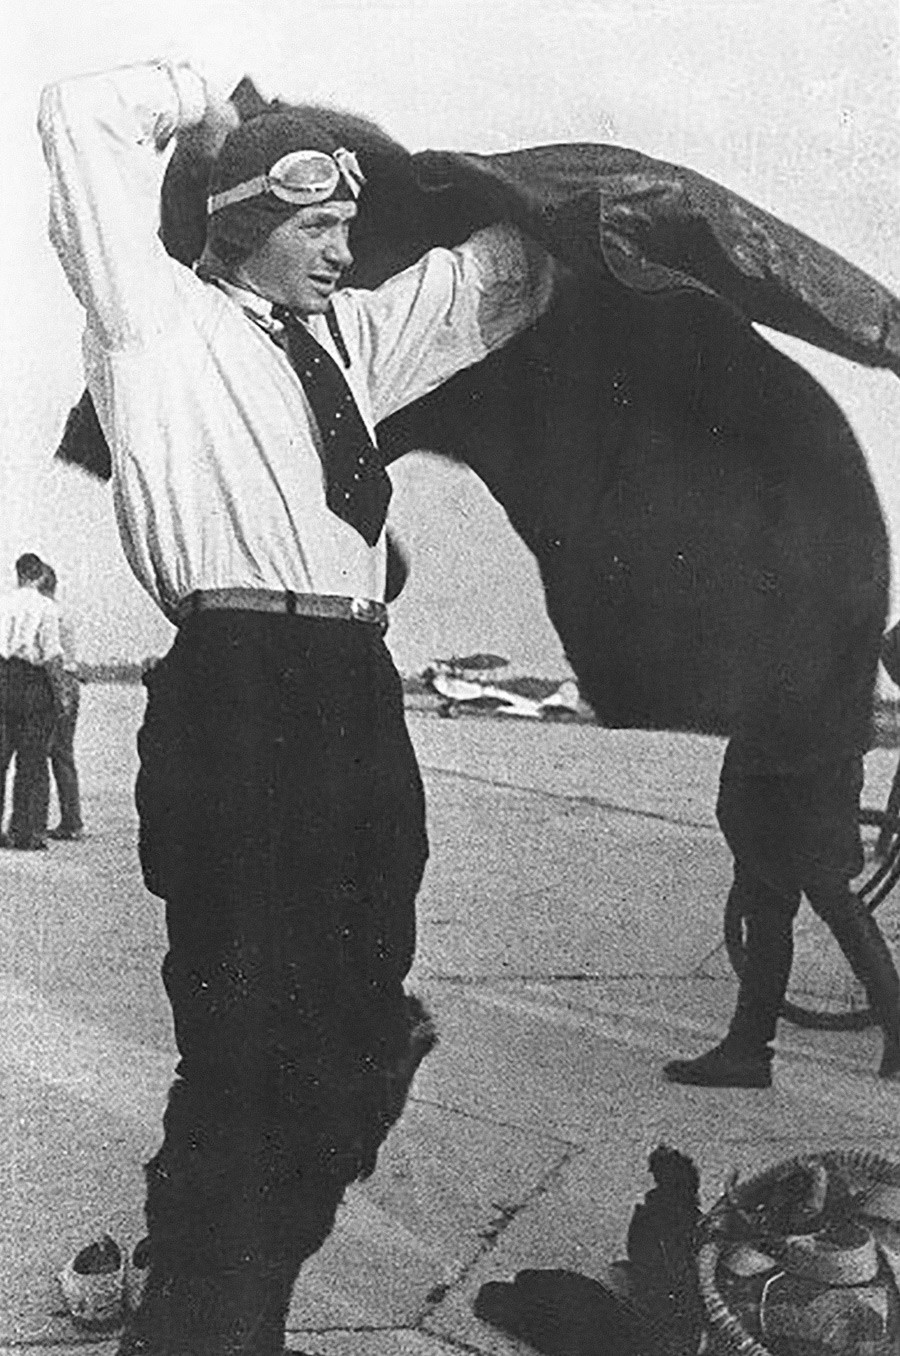 Test pilot Vladimir Kokkinaki before his next flight, 1930s